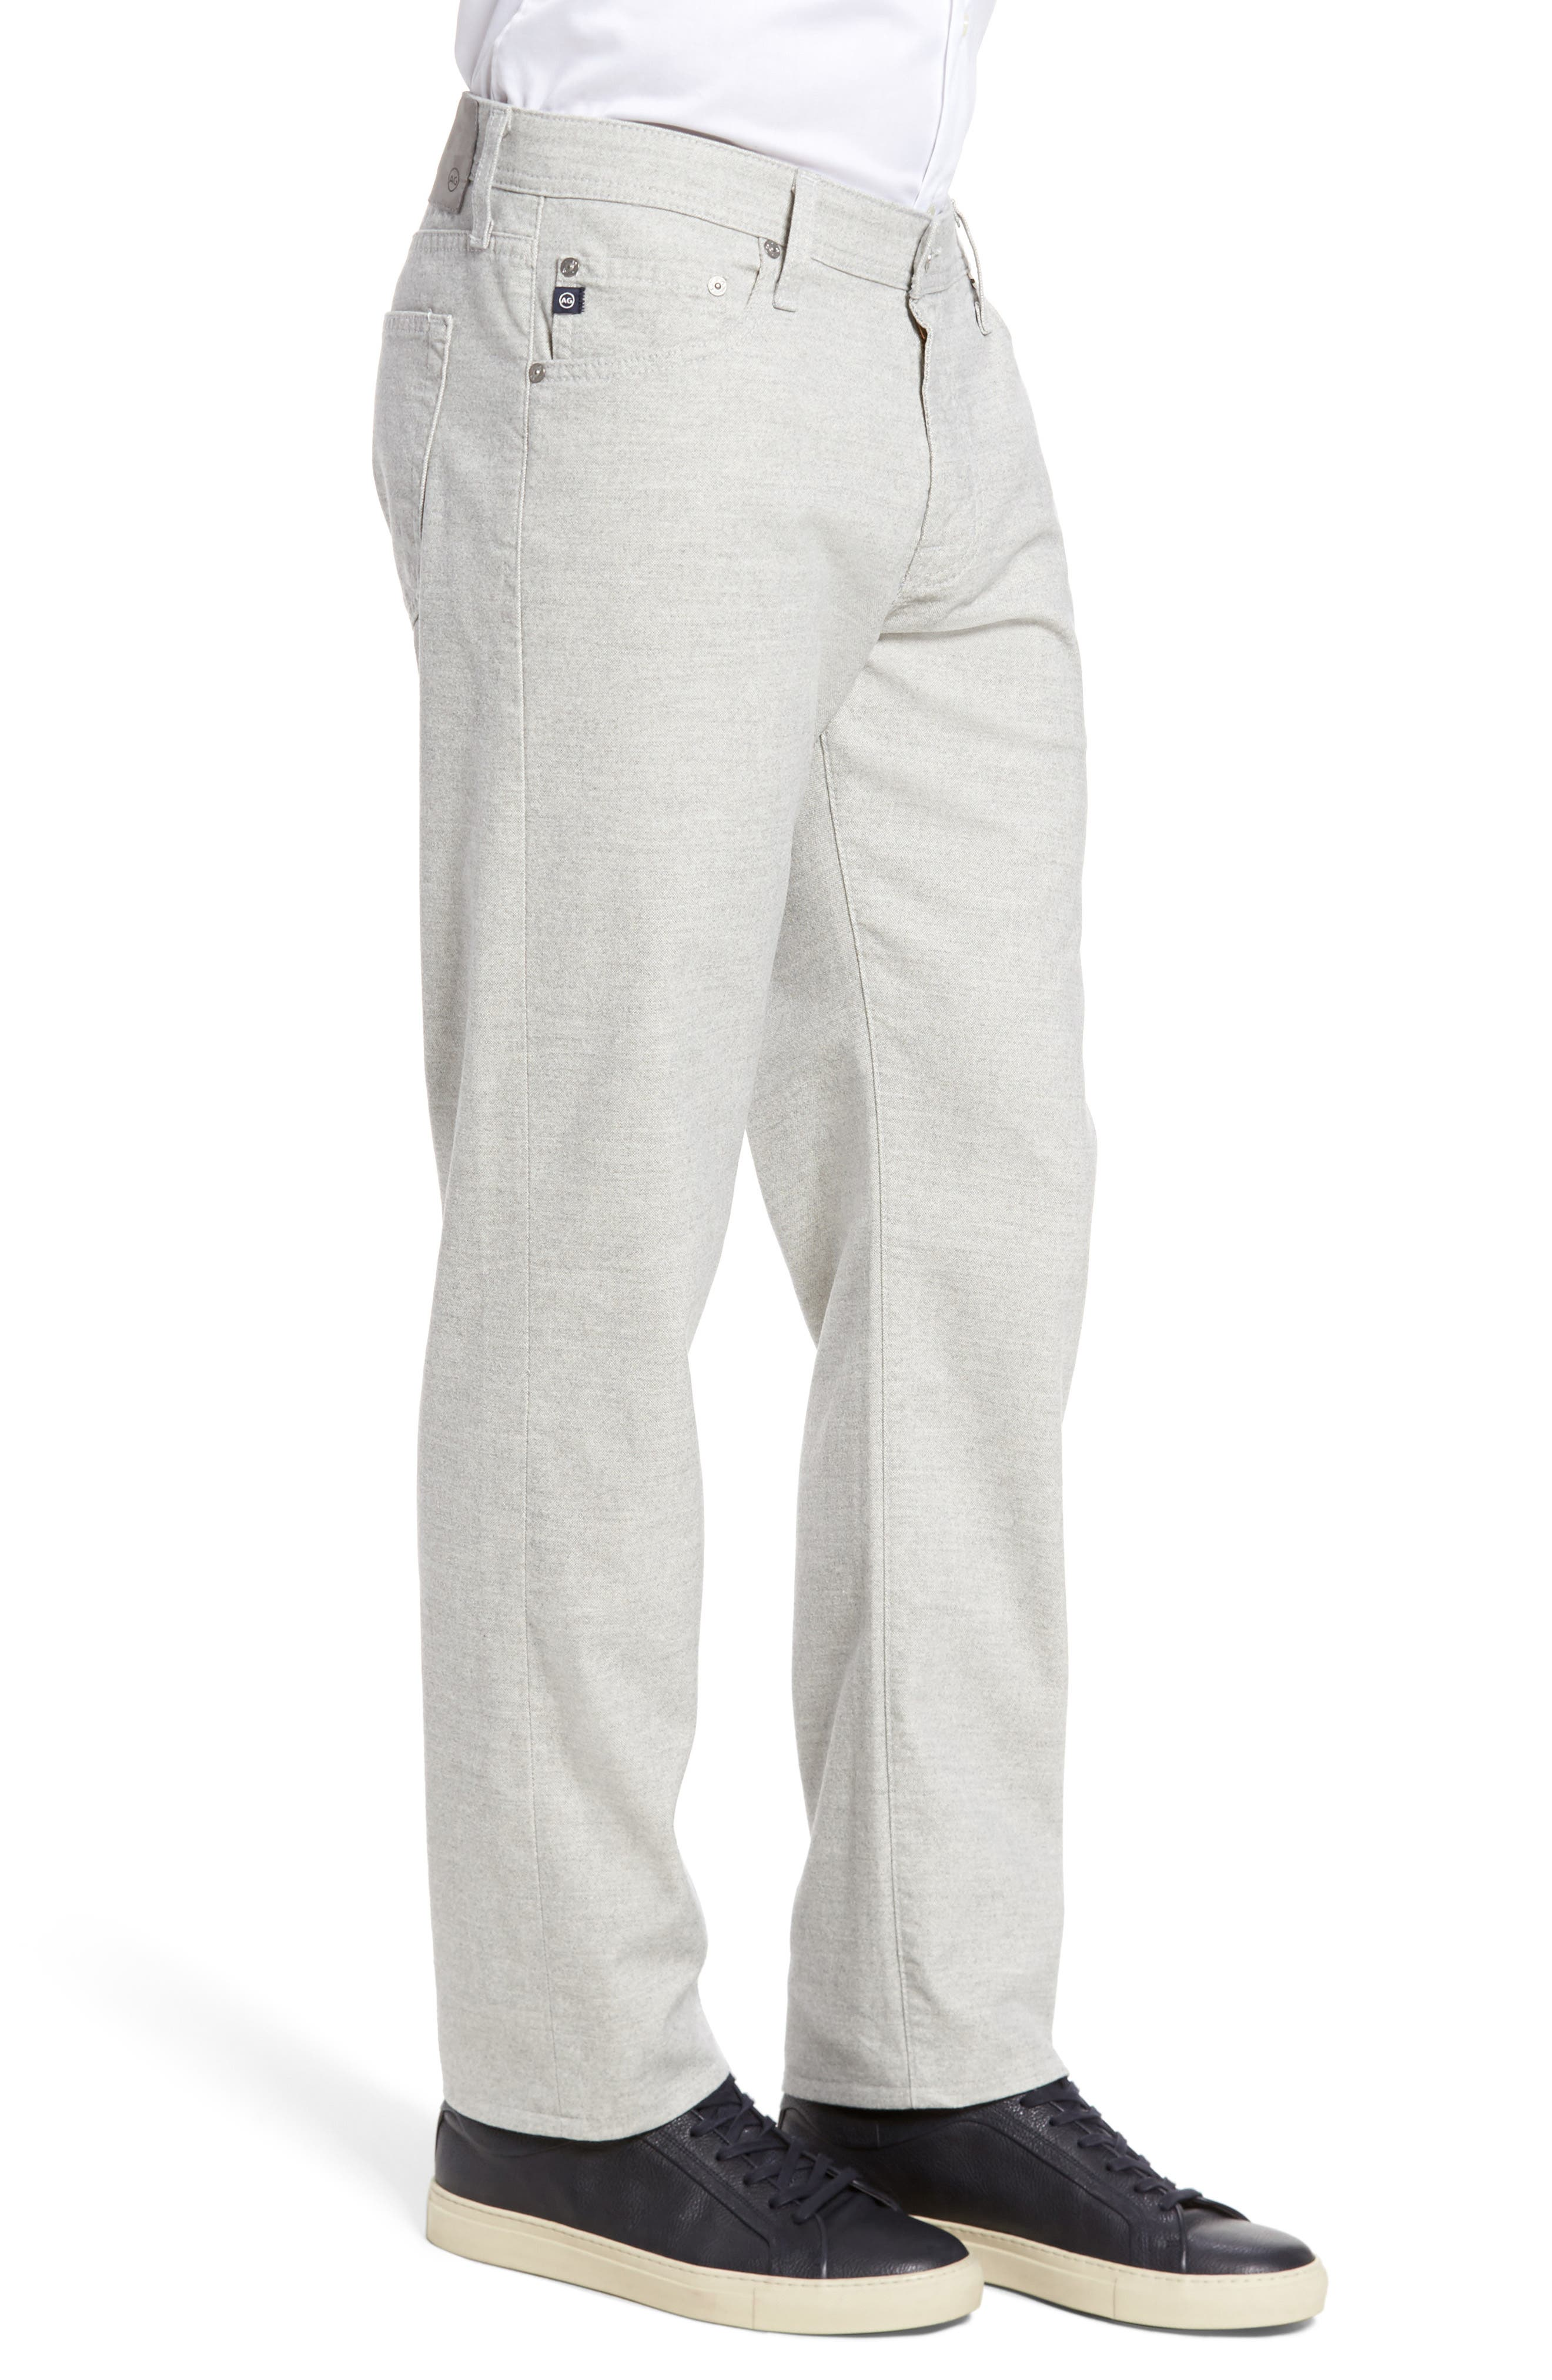 Graduate Tailored Five-Pocket Straight Leg Pants,                             Alternate thumbnail 3, color,                             020